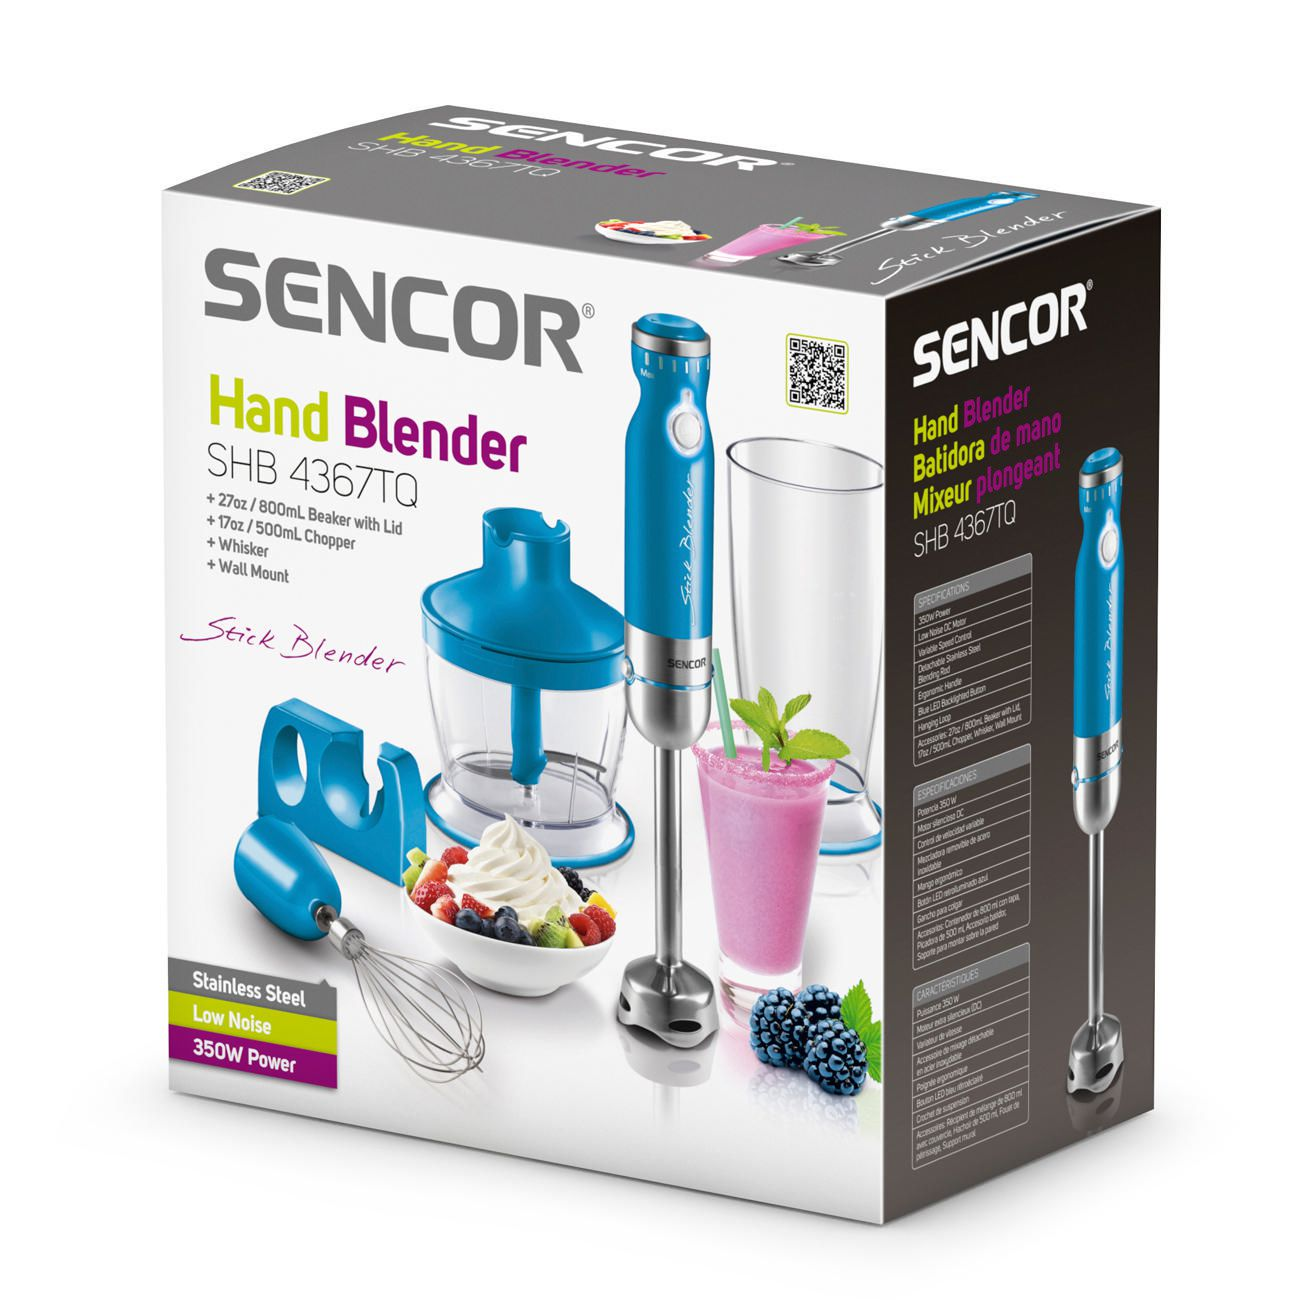 Sencor SHB-4367TQ Stick Hand Blender Set - Turquoise   Walmart Canada